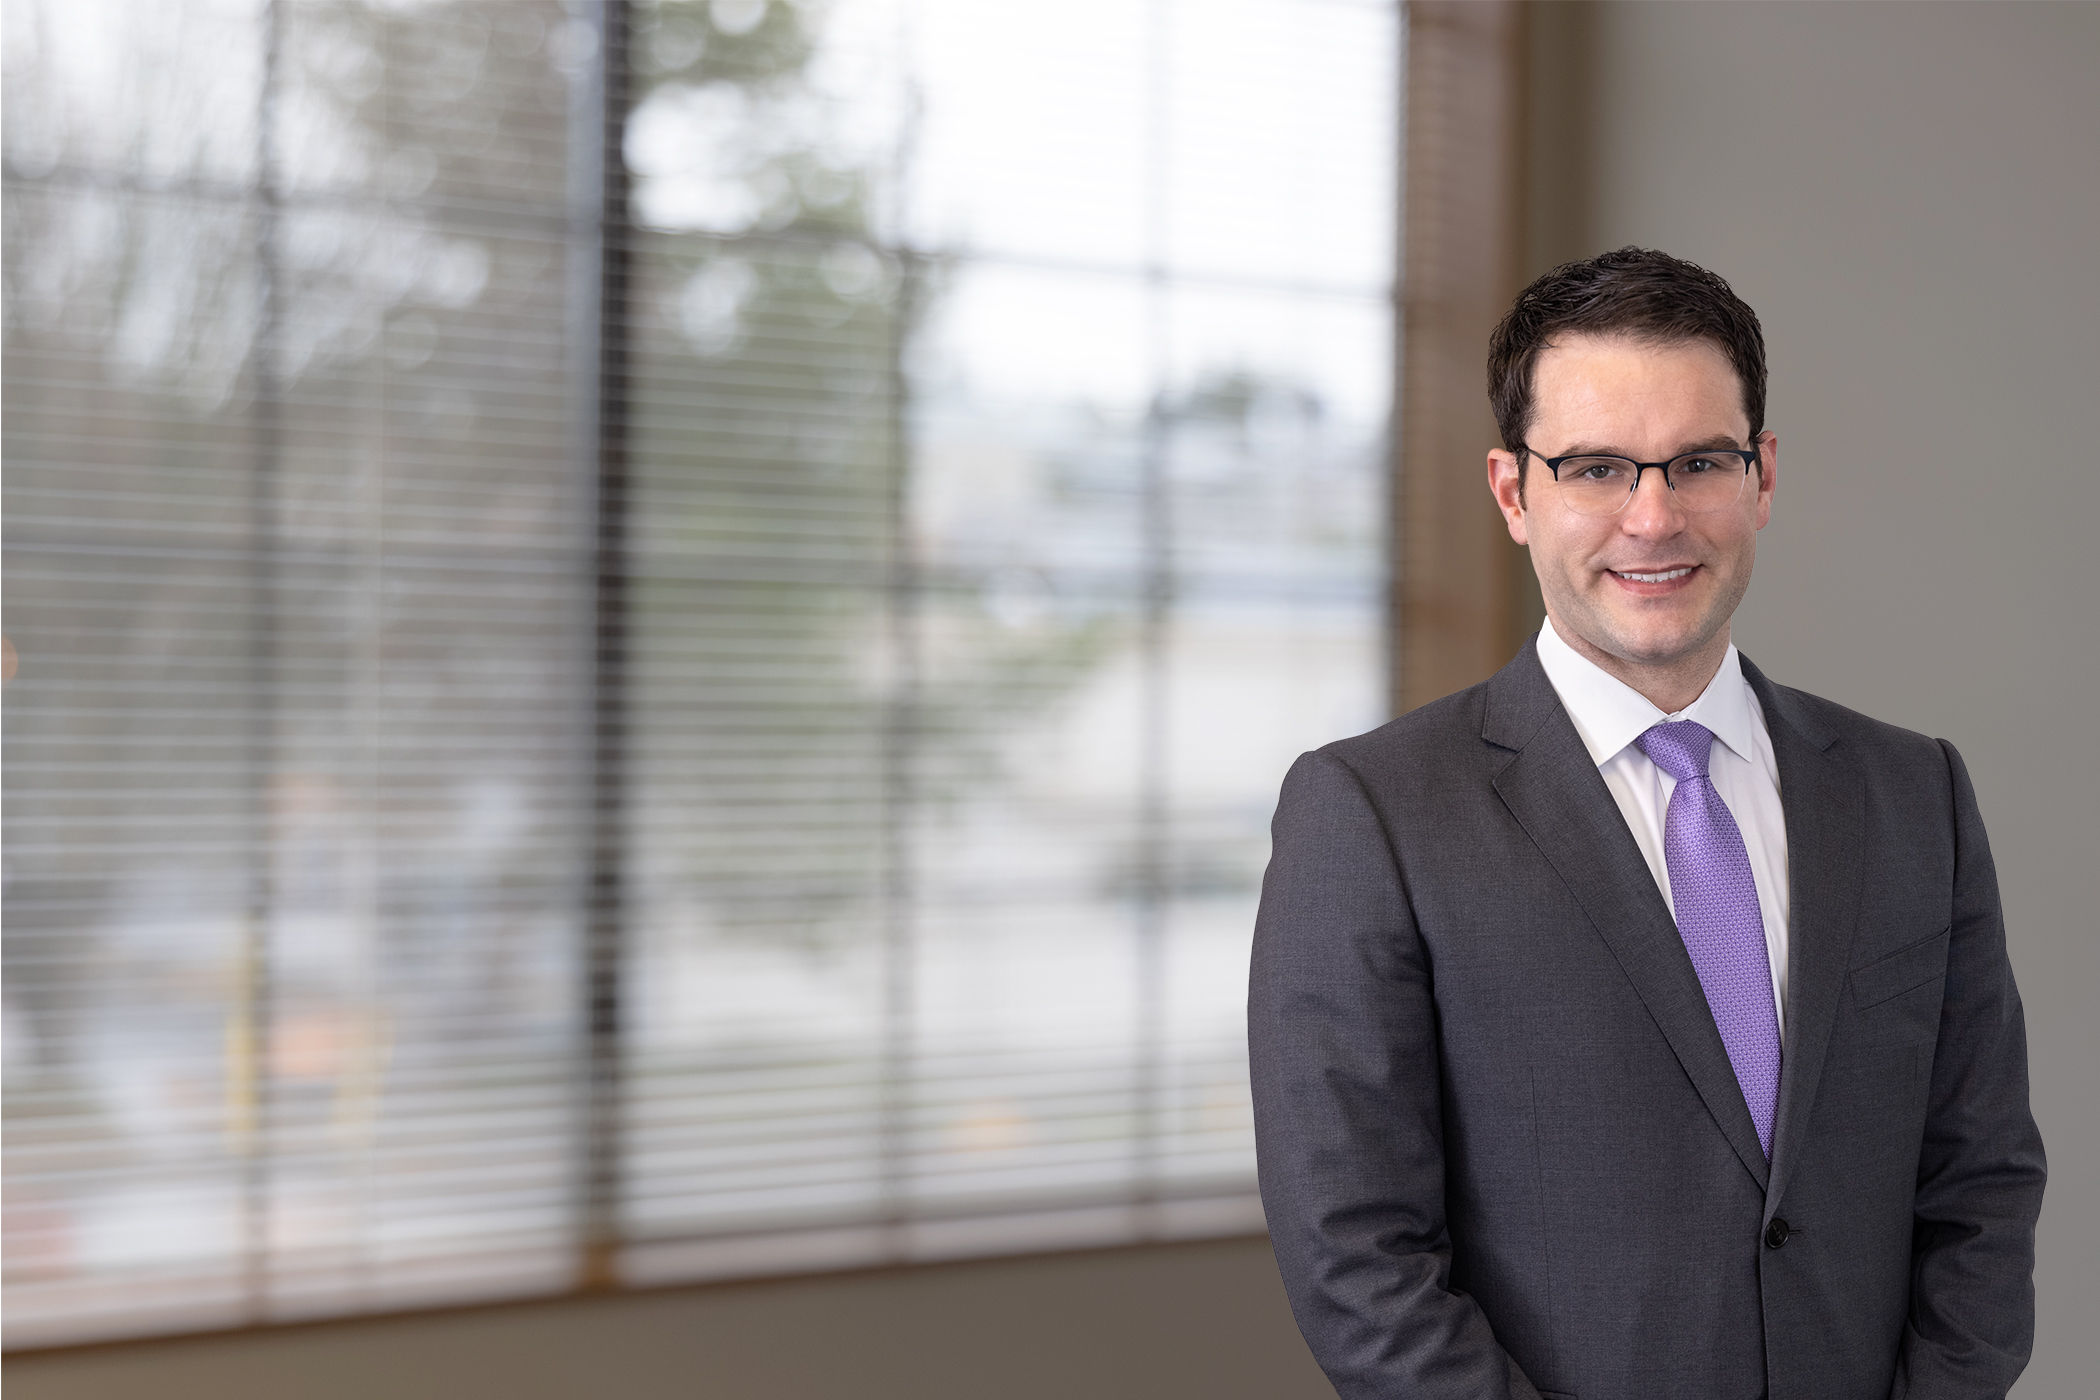 Ryan J. P. Dyer, Edmonds Lawyer